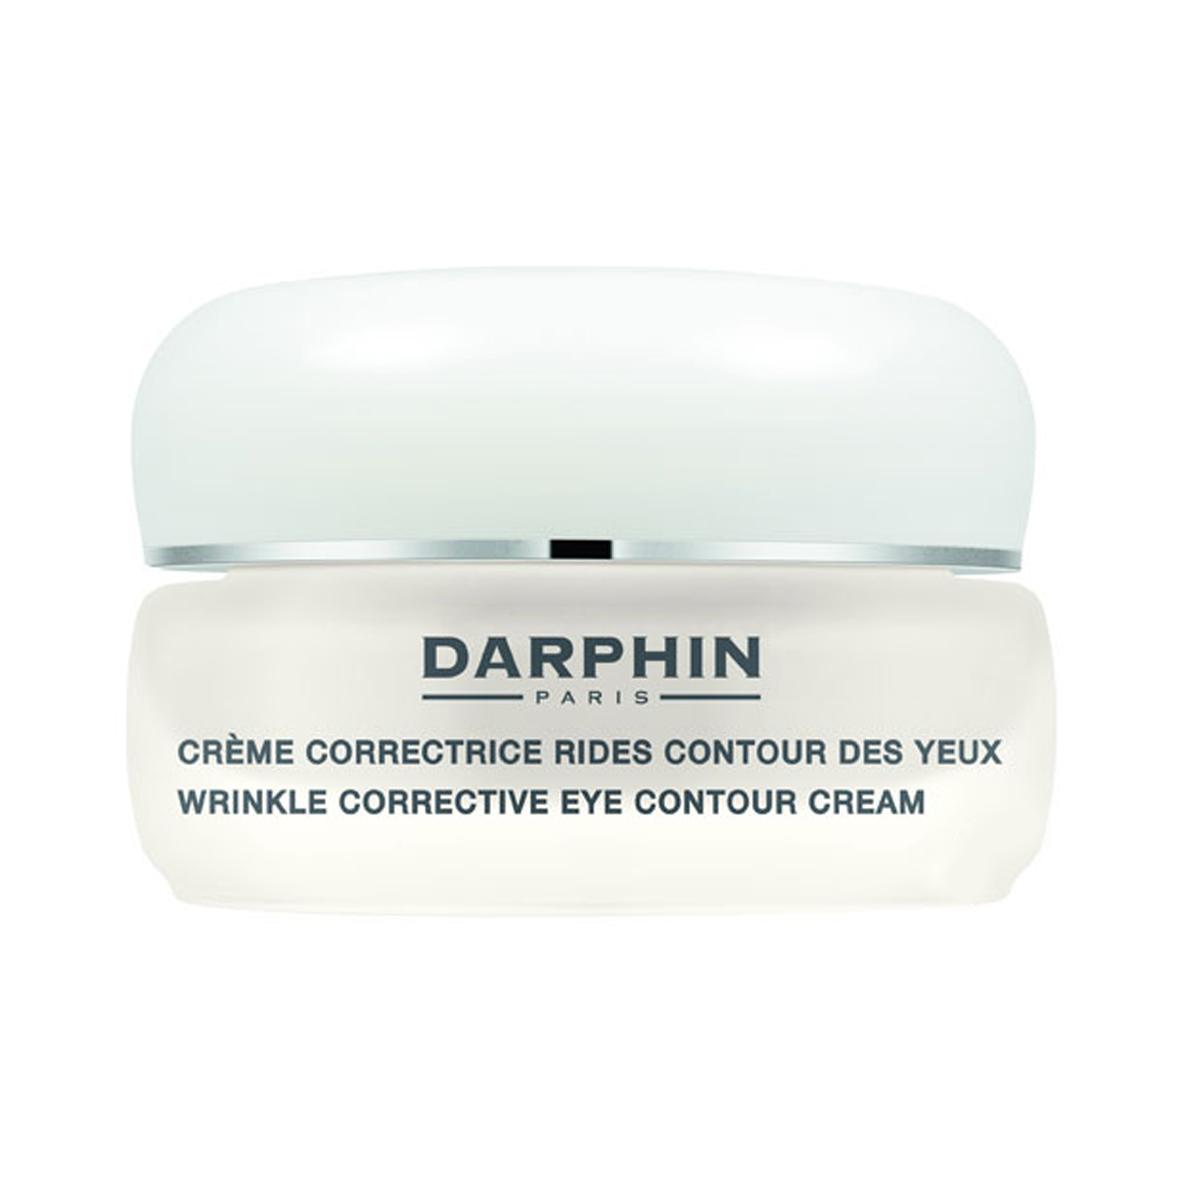 Wrinkle Corrective Eye Contour Cream